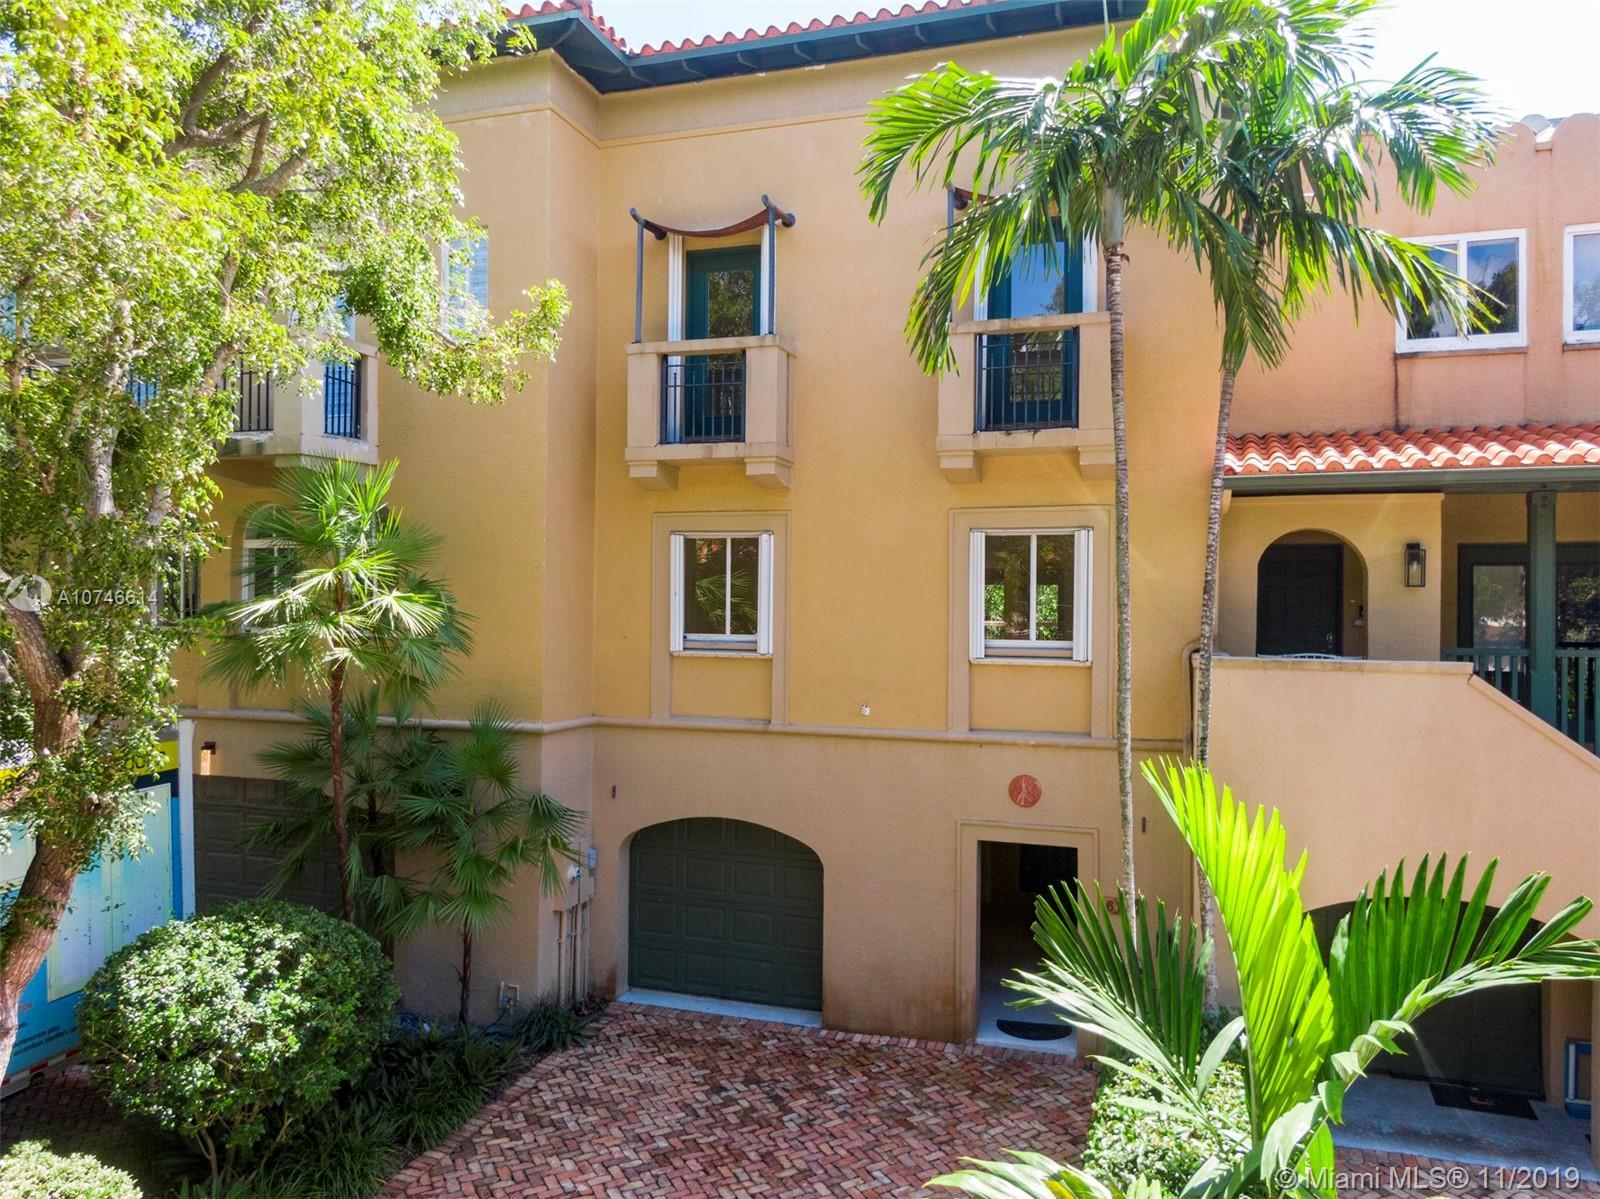 6147 Paradise Point Dr, Palmetto Bay FL 33157